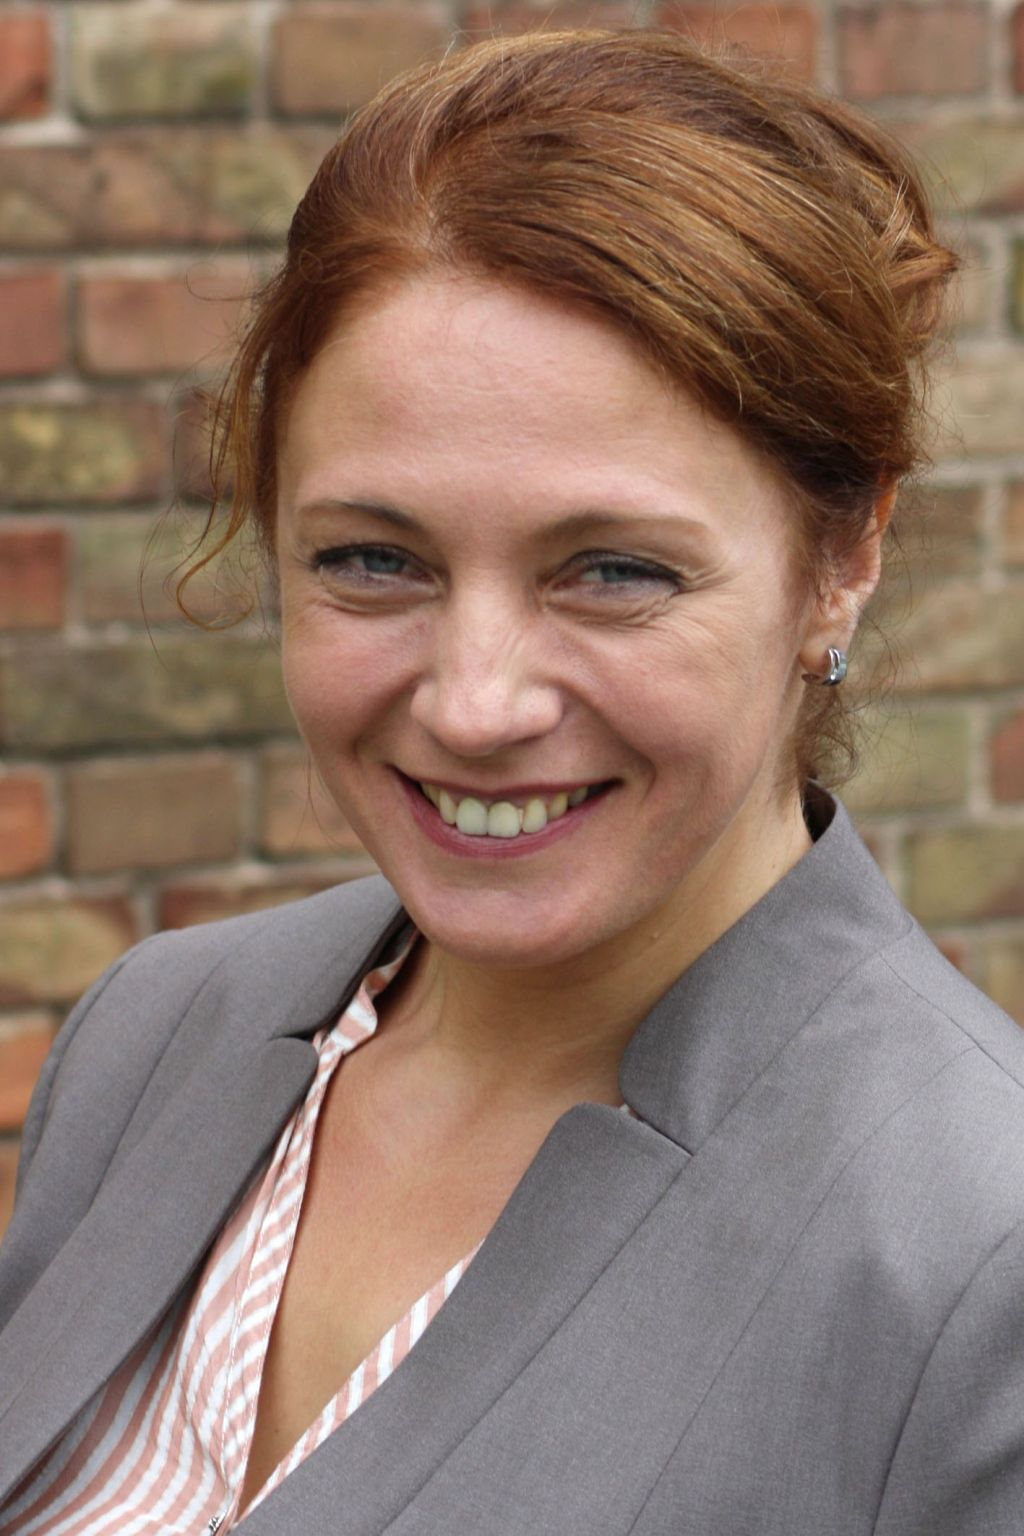 Frieda Haberlach